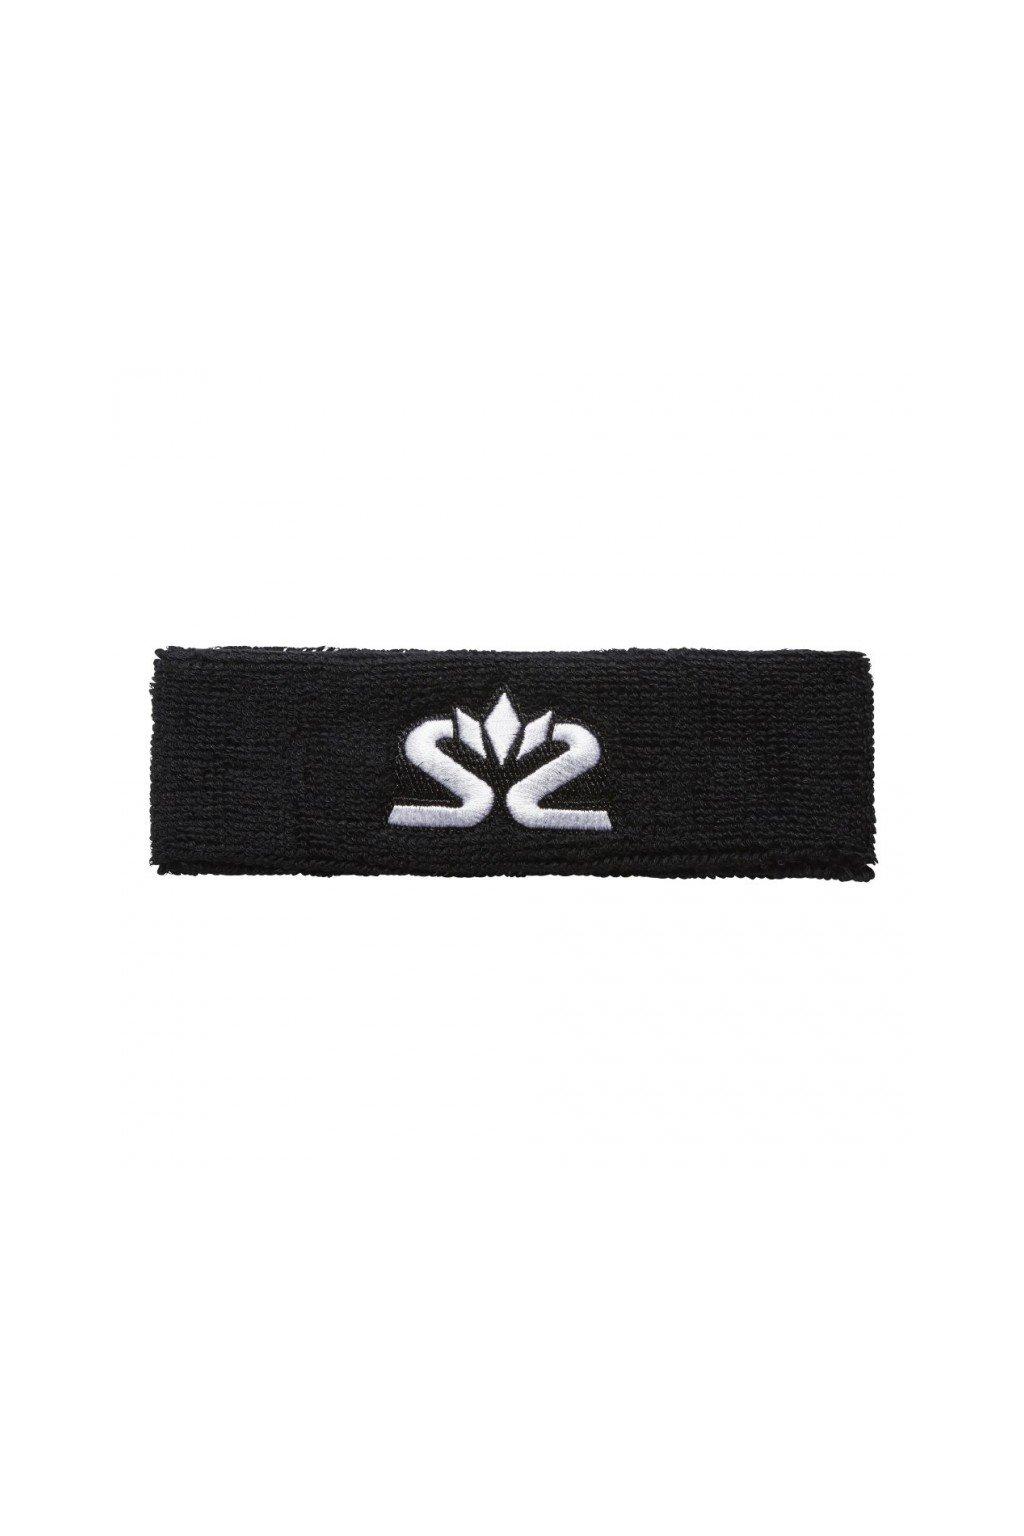 salming knitted headband black white